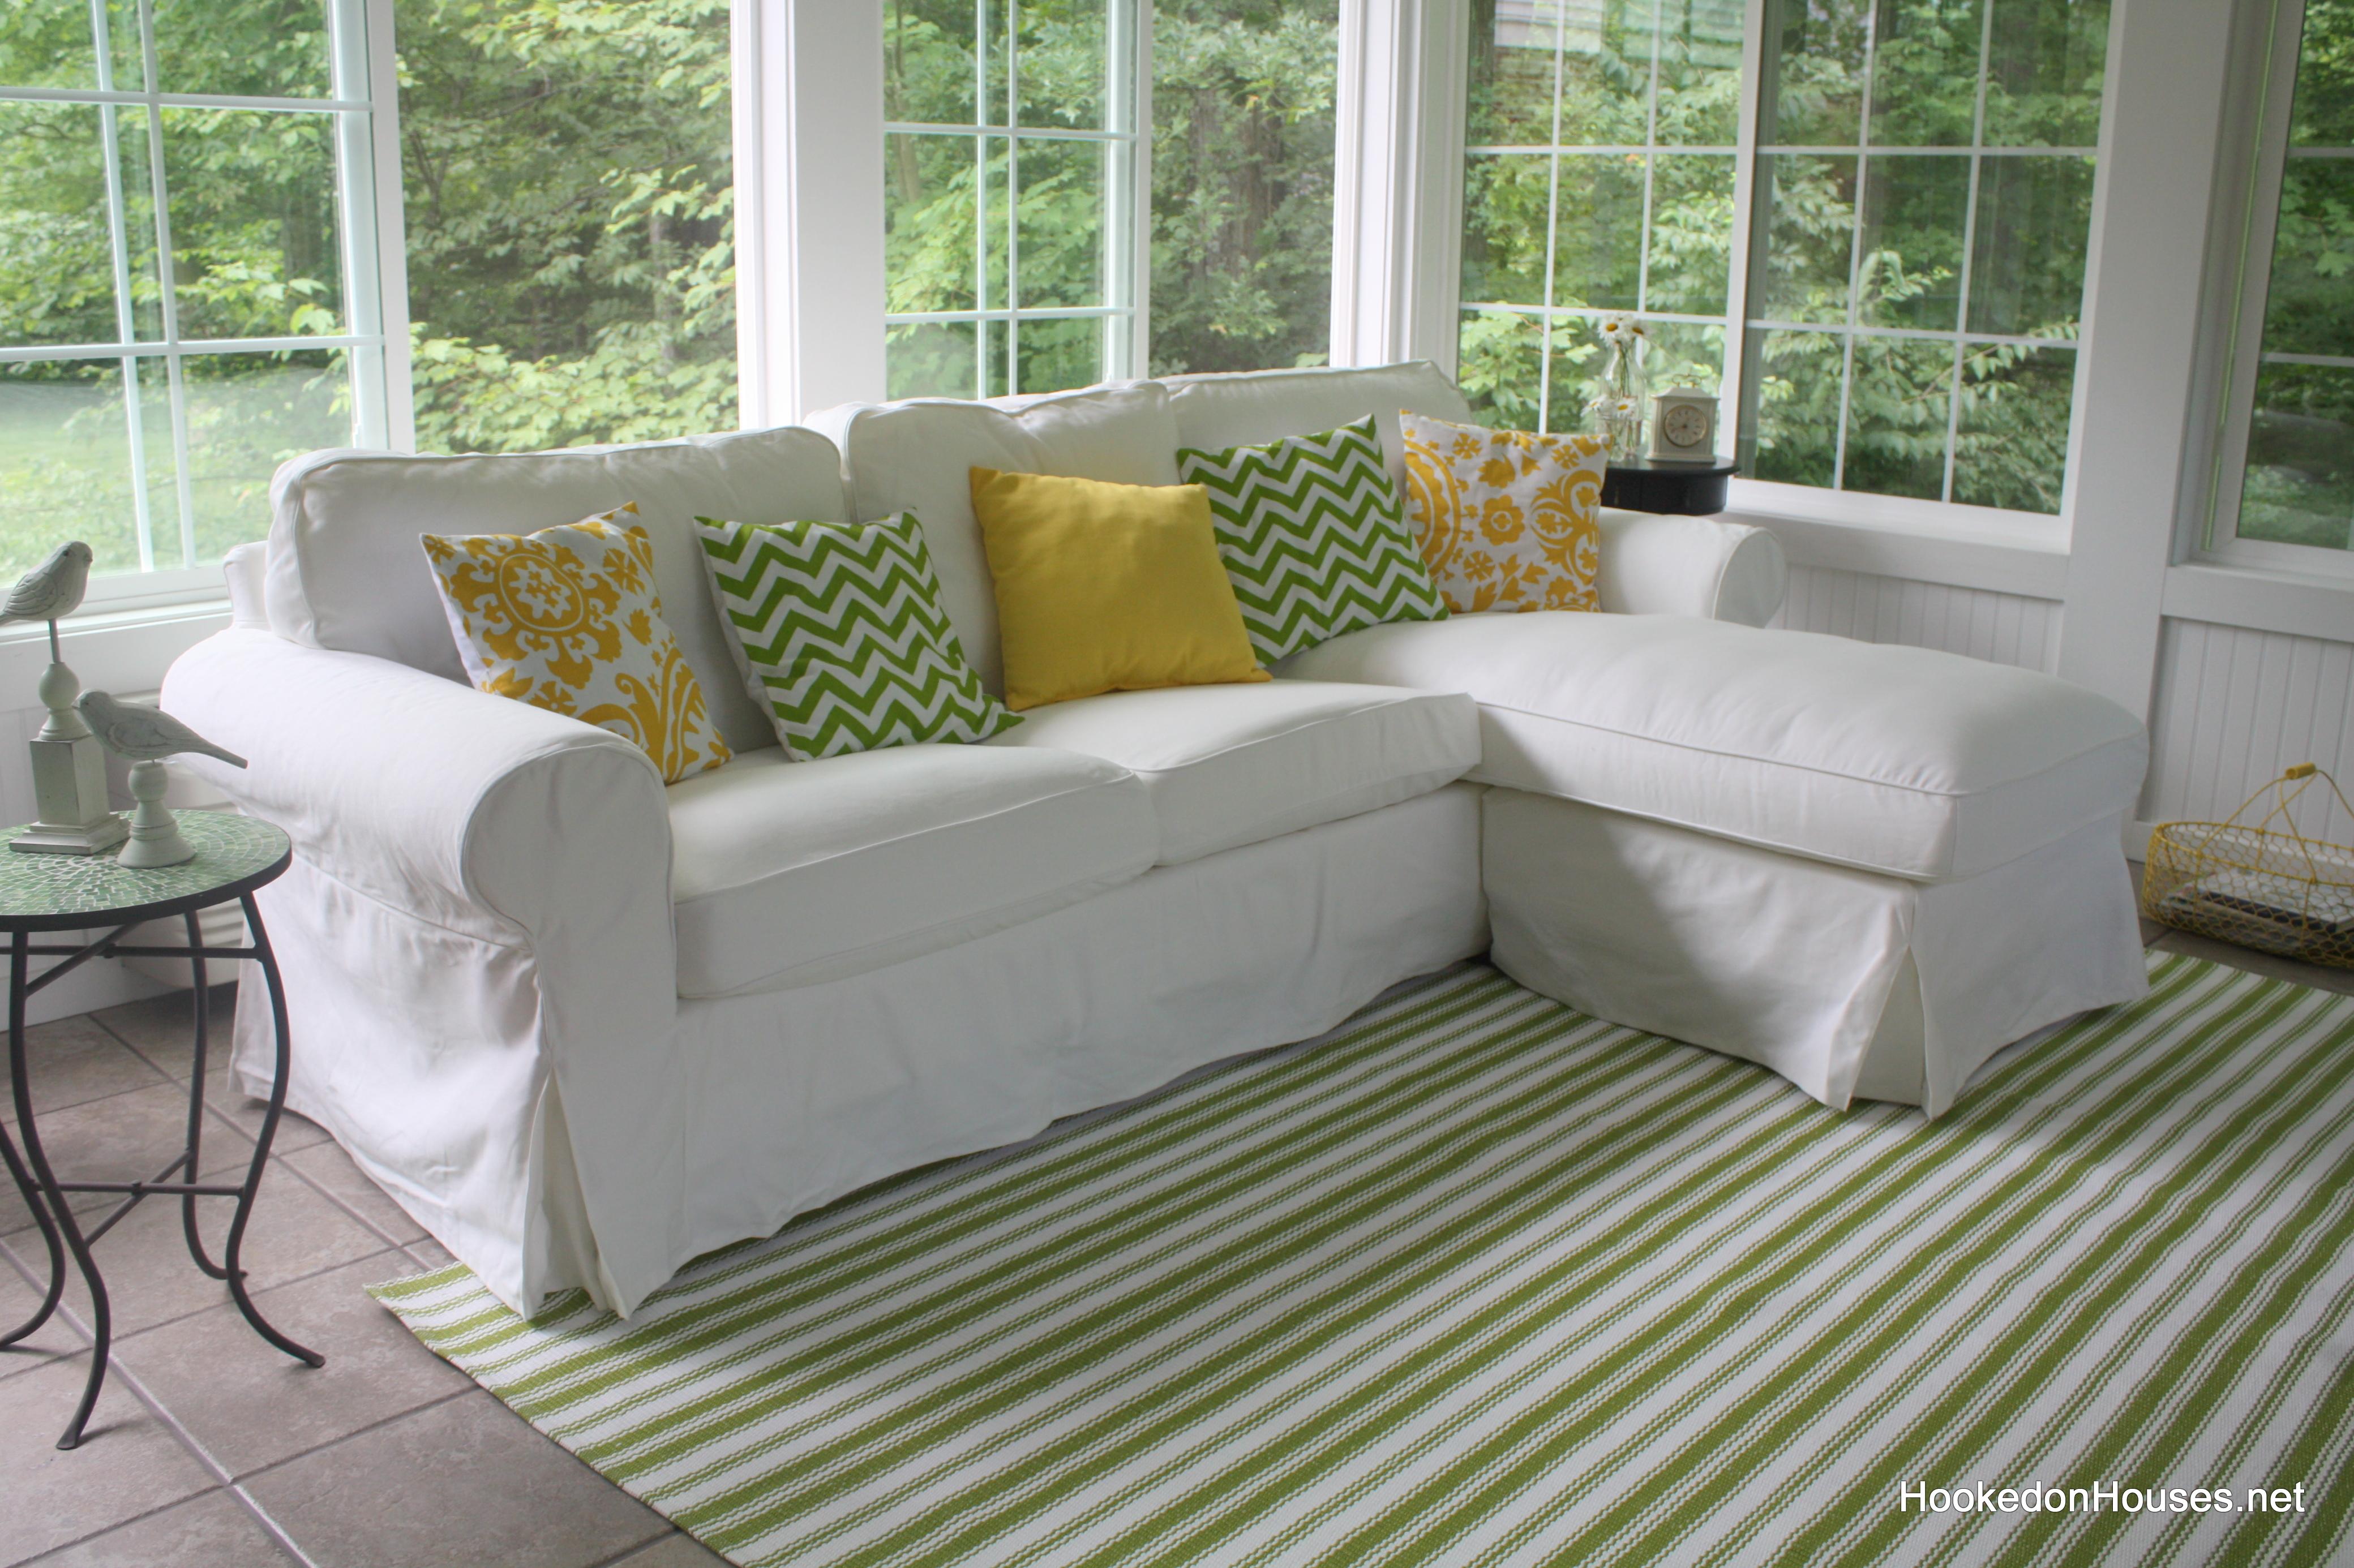 Sofa with rug 7 11 hooked on houses - Fundas sofa ikea ...